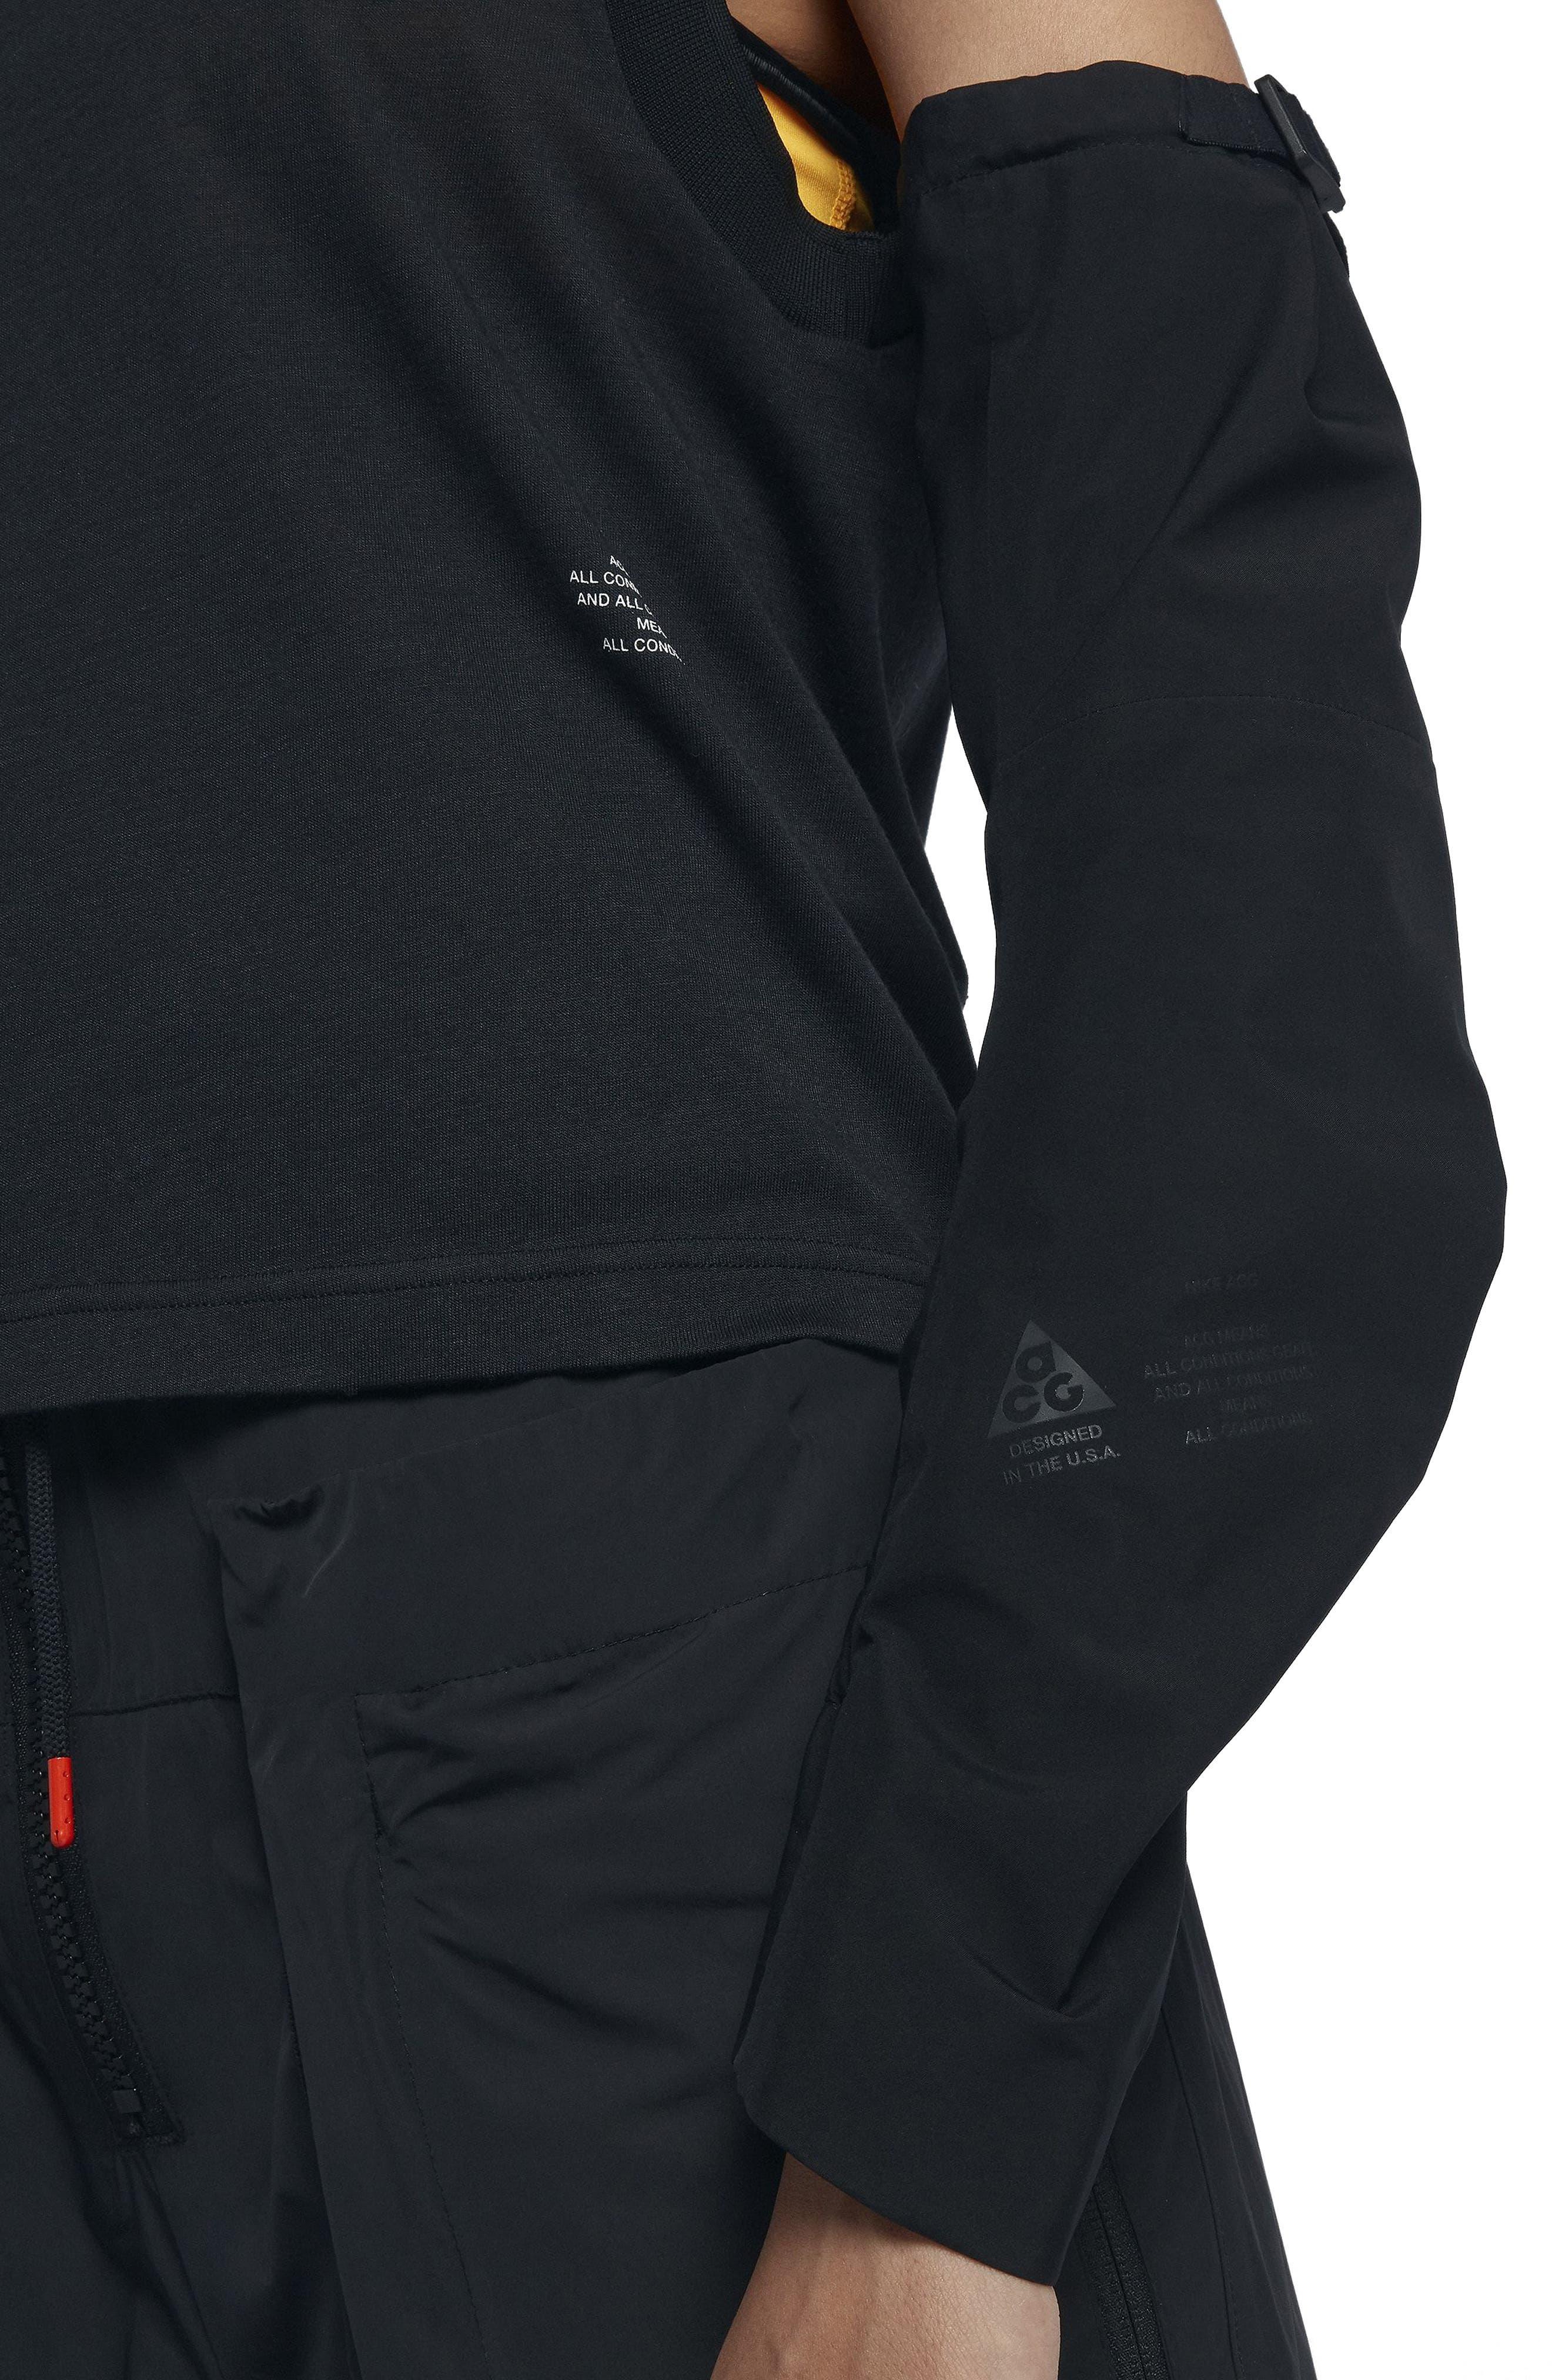 NikeLab ACG Gore-Tex<sup>®</sup> Women's Jacket,                             Alternate thumbnail 6, color,                             010